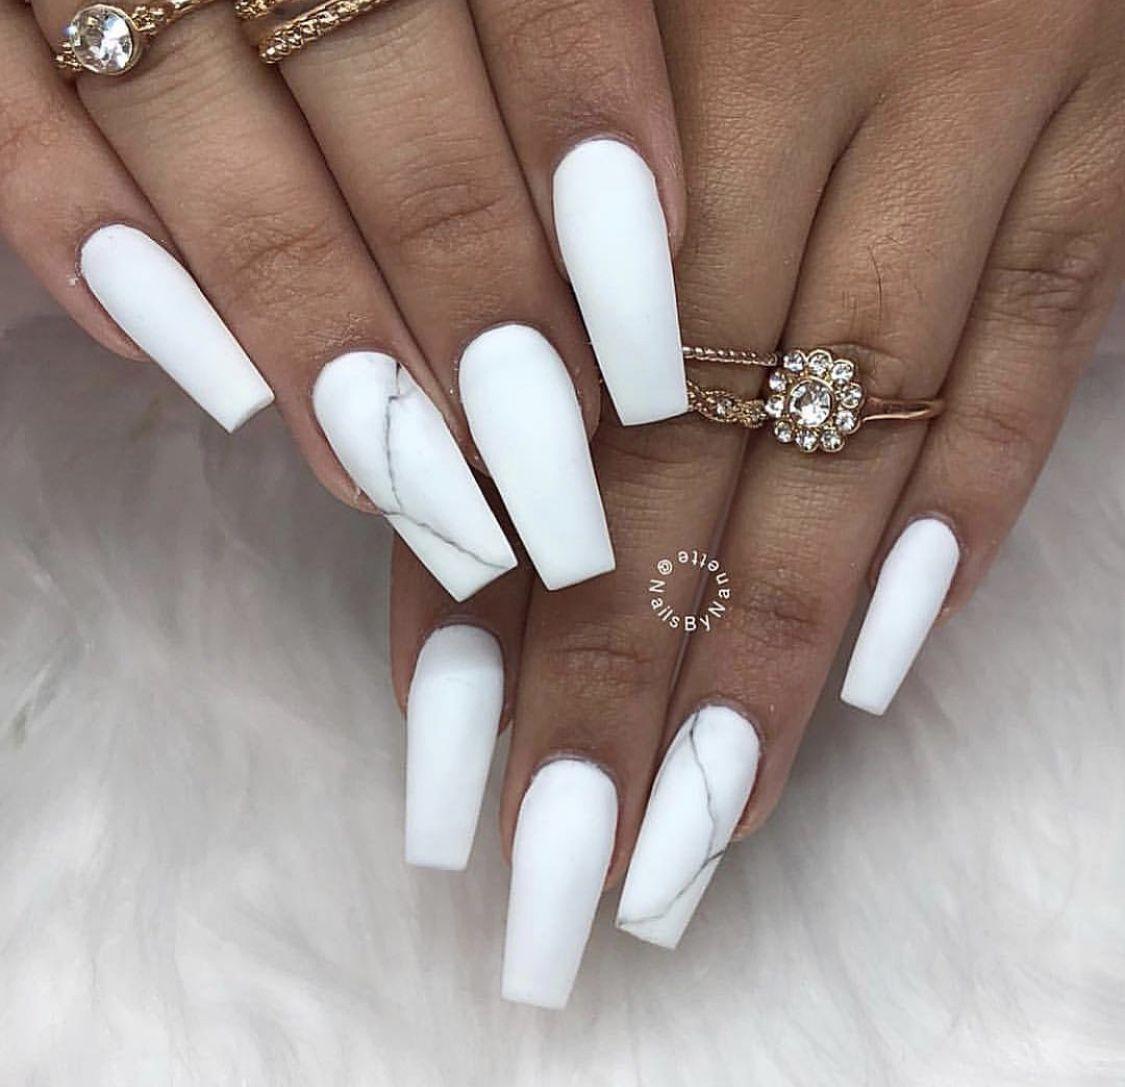 Itsjustdestinylovee For Nail Pins White Acrylic Nails Pretty Acrylic Nails Trendy Nails